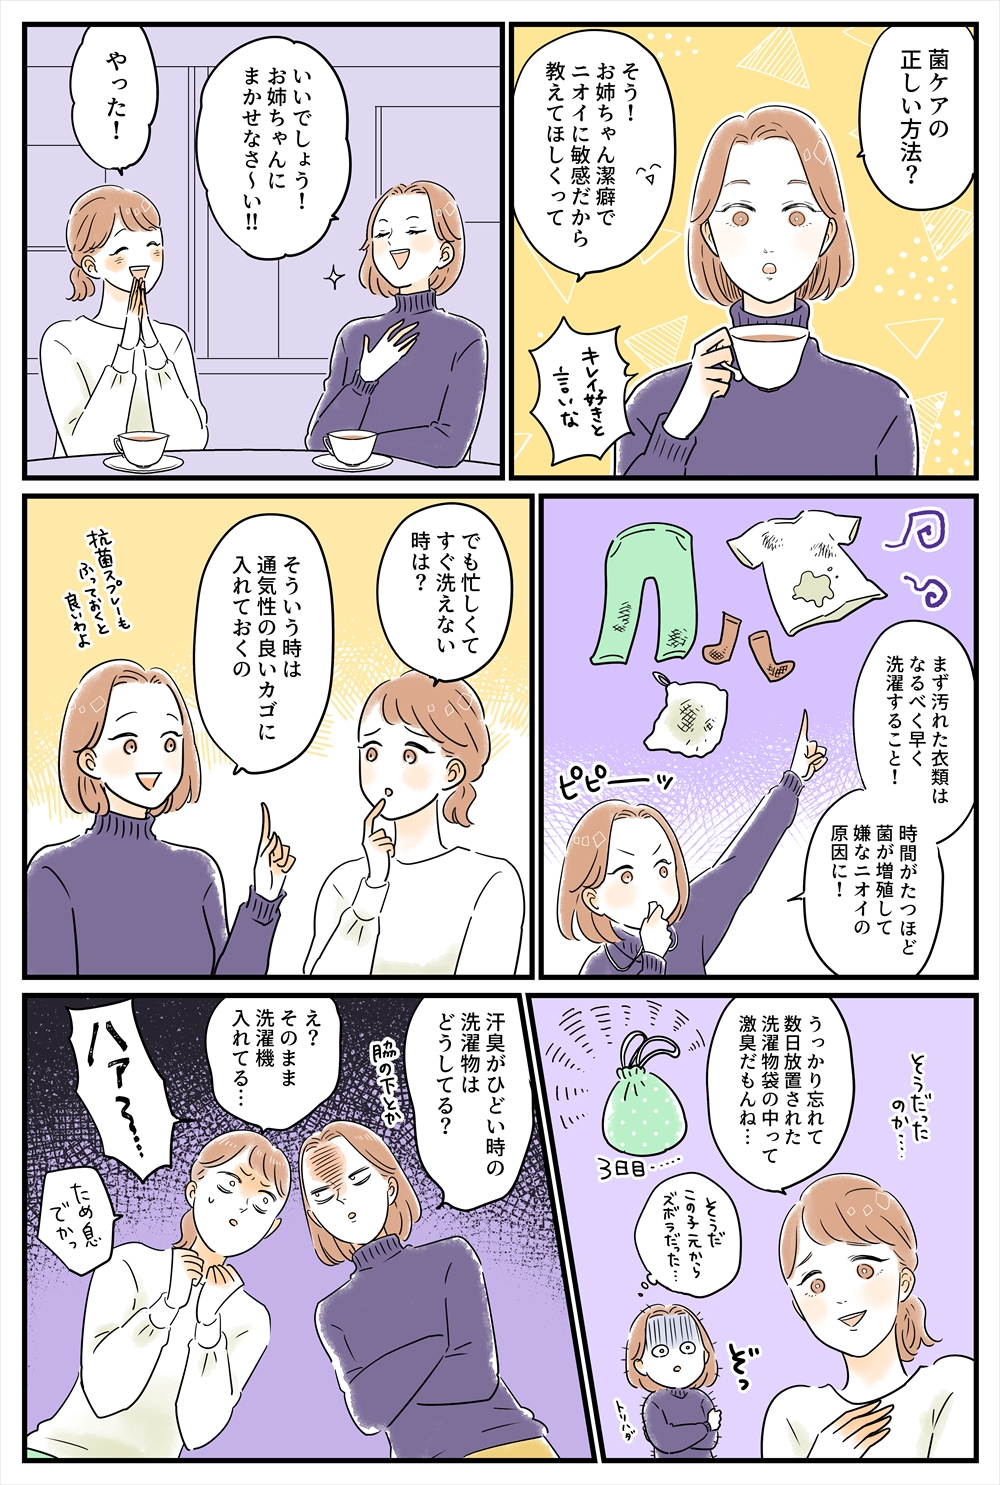 NANOXウェブ漫画-2P_r